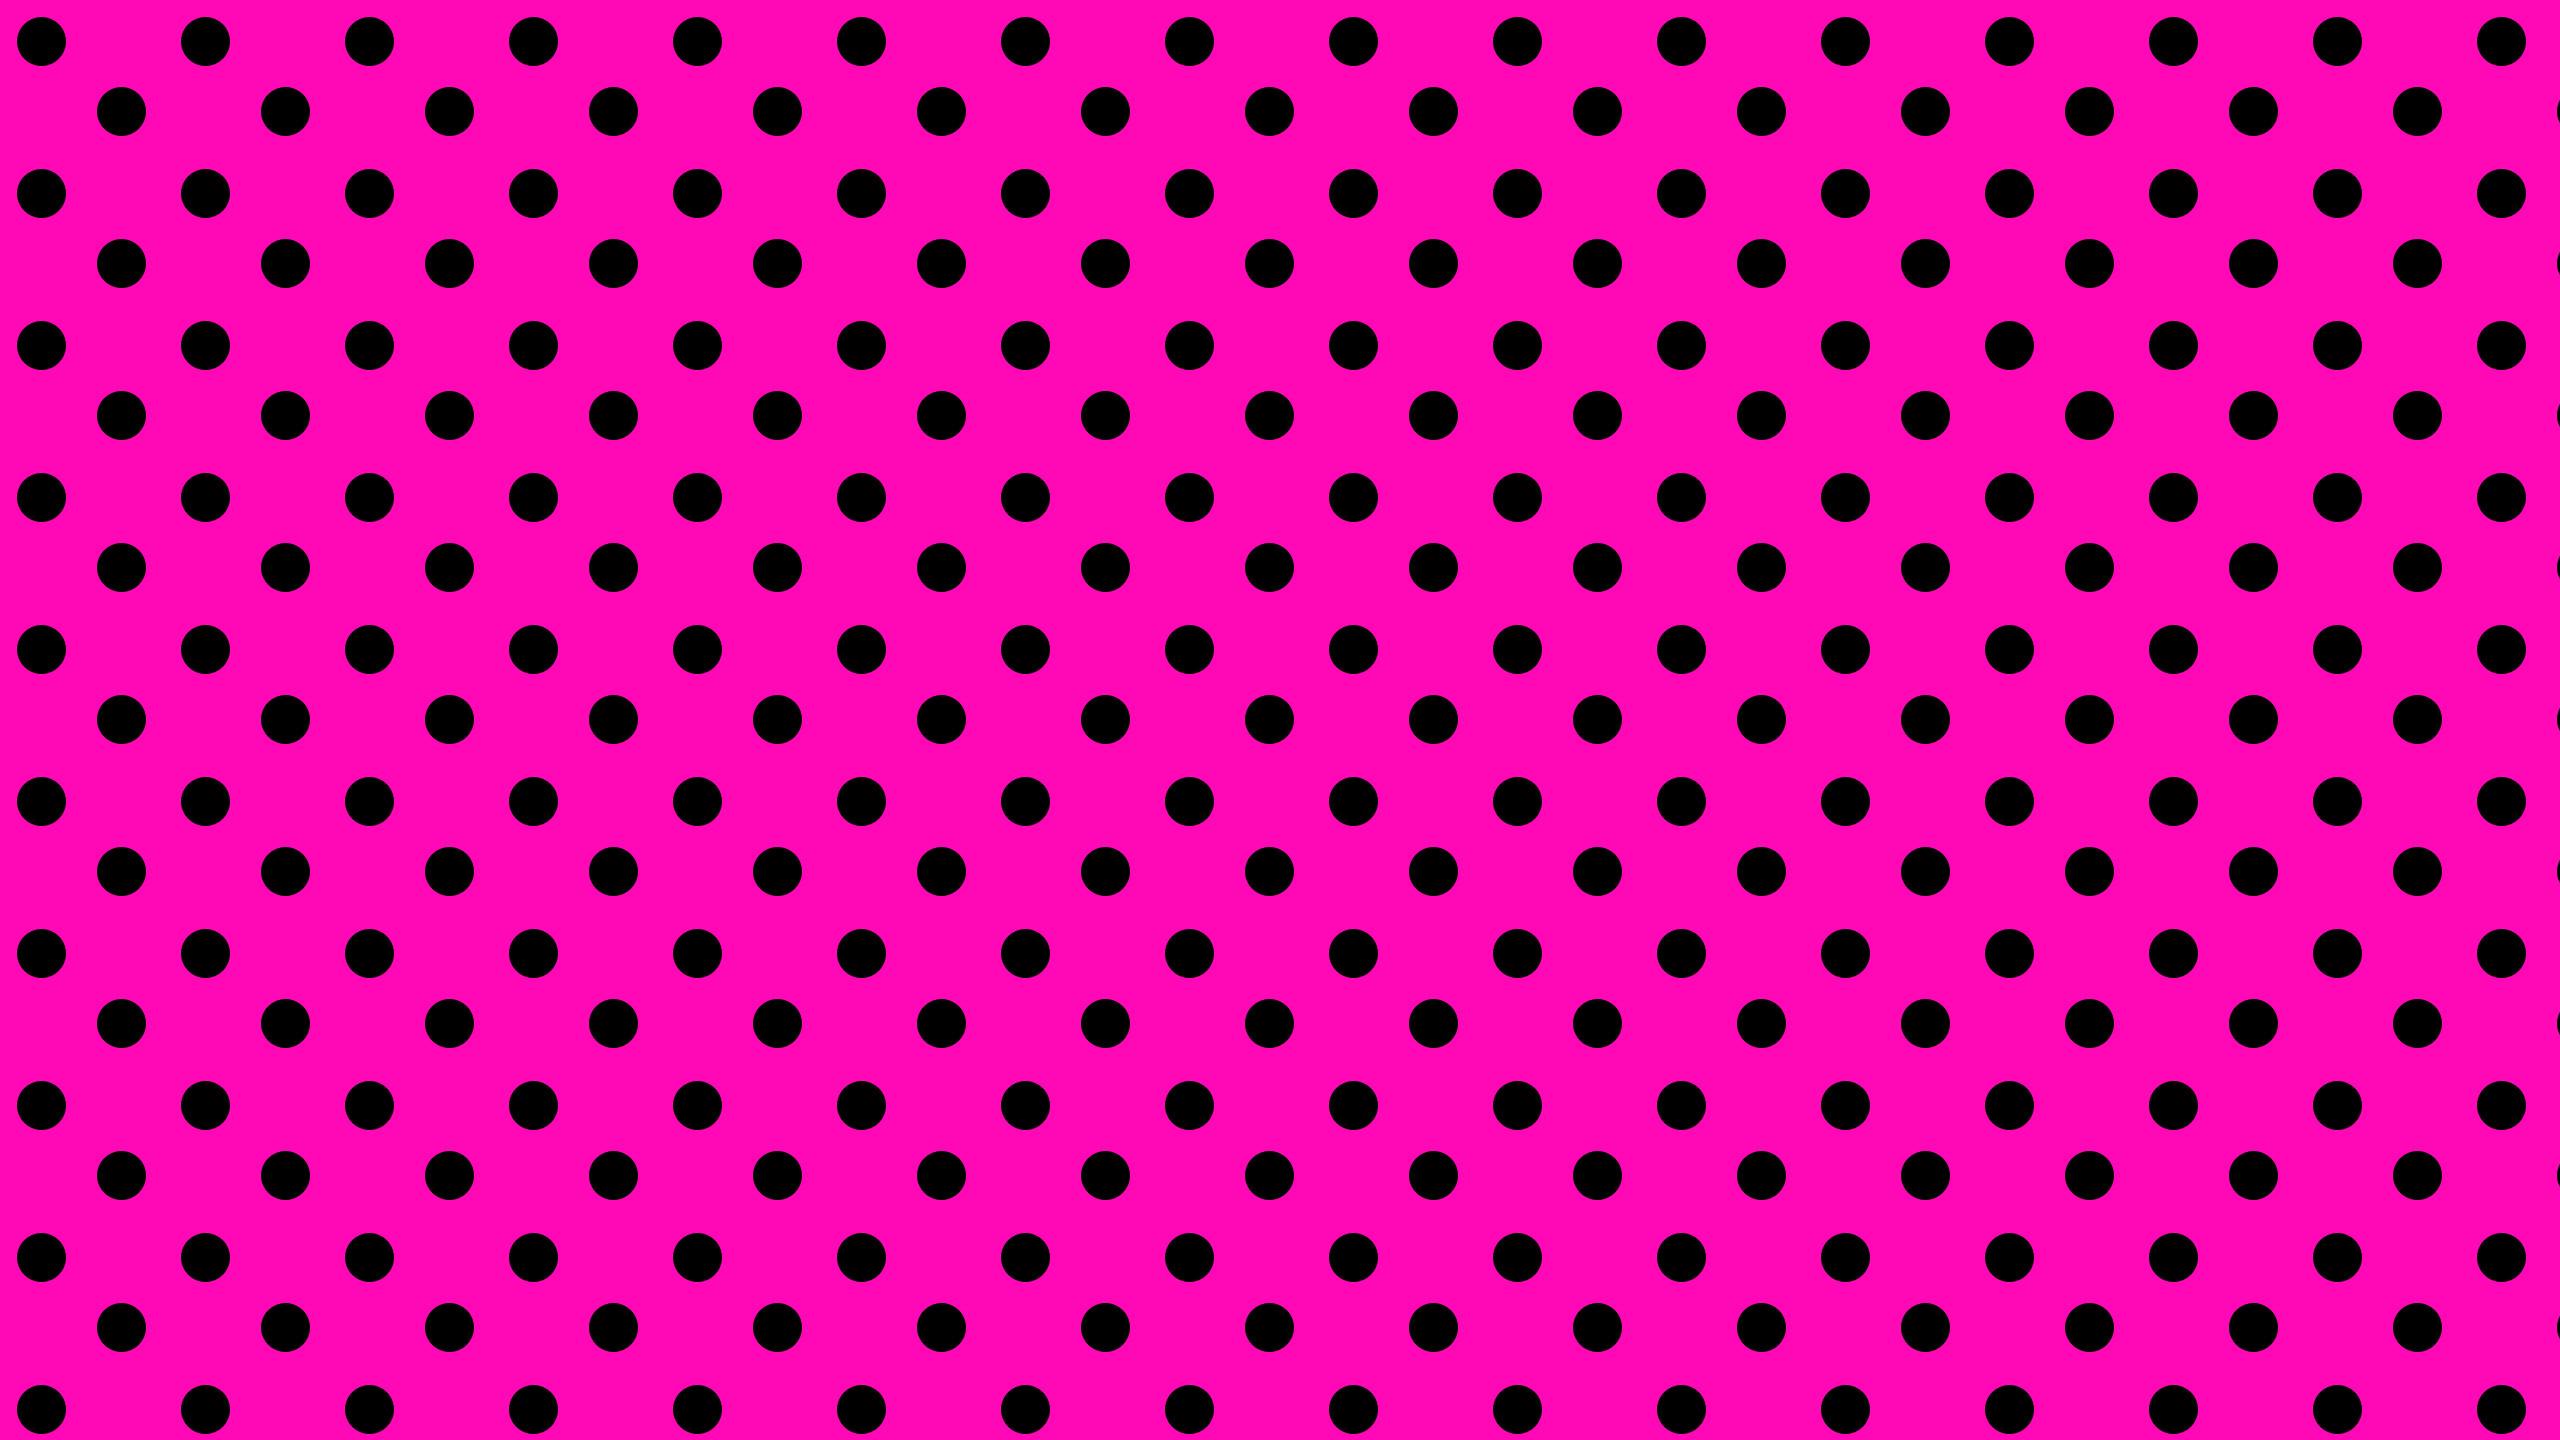 Large Pink Black Desktop Wallpaper is easy. Just save the wallpaper .